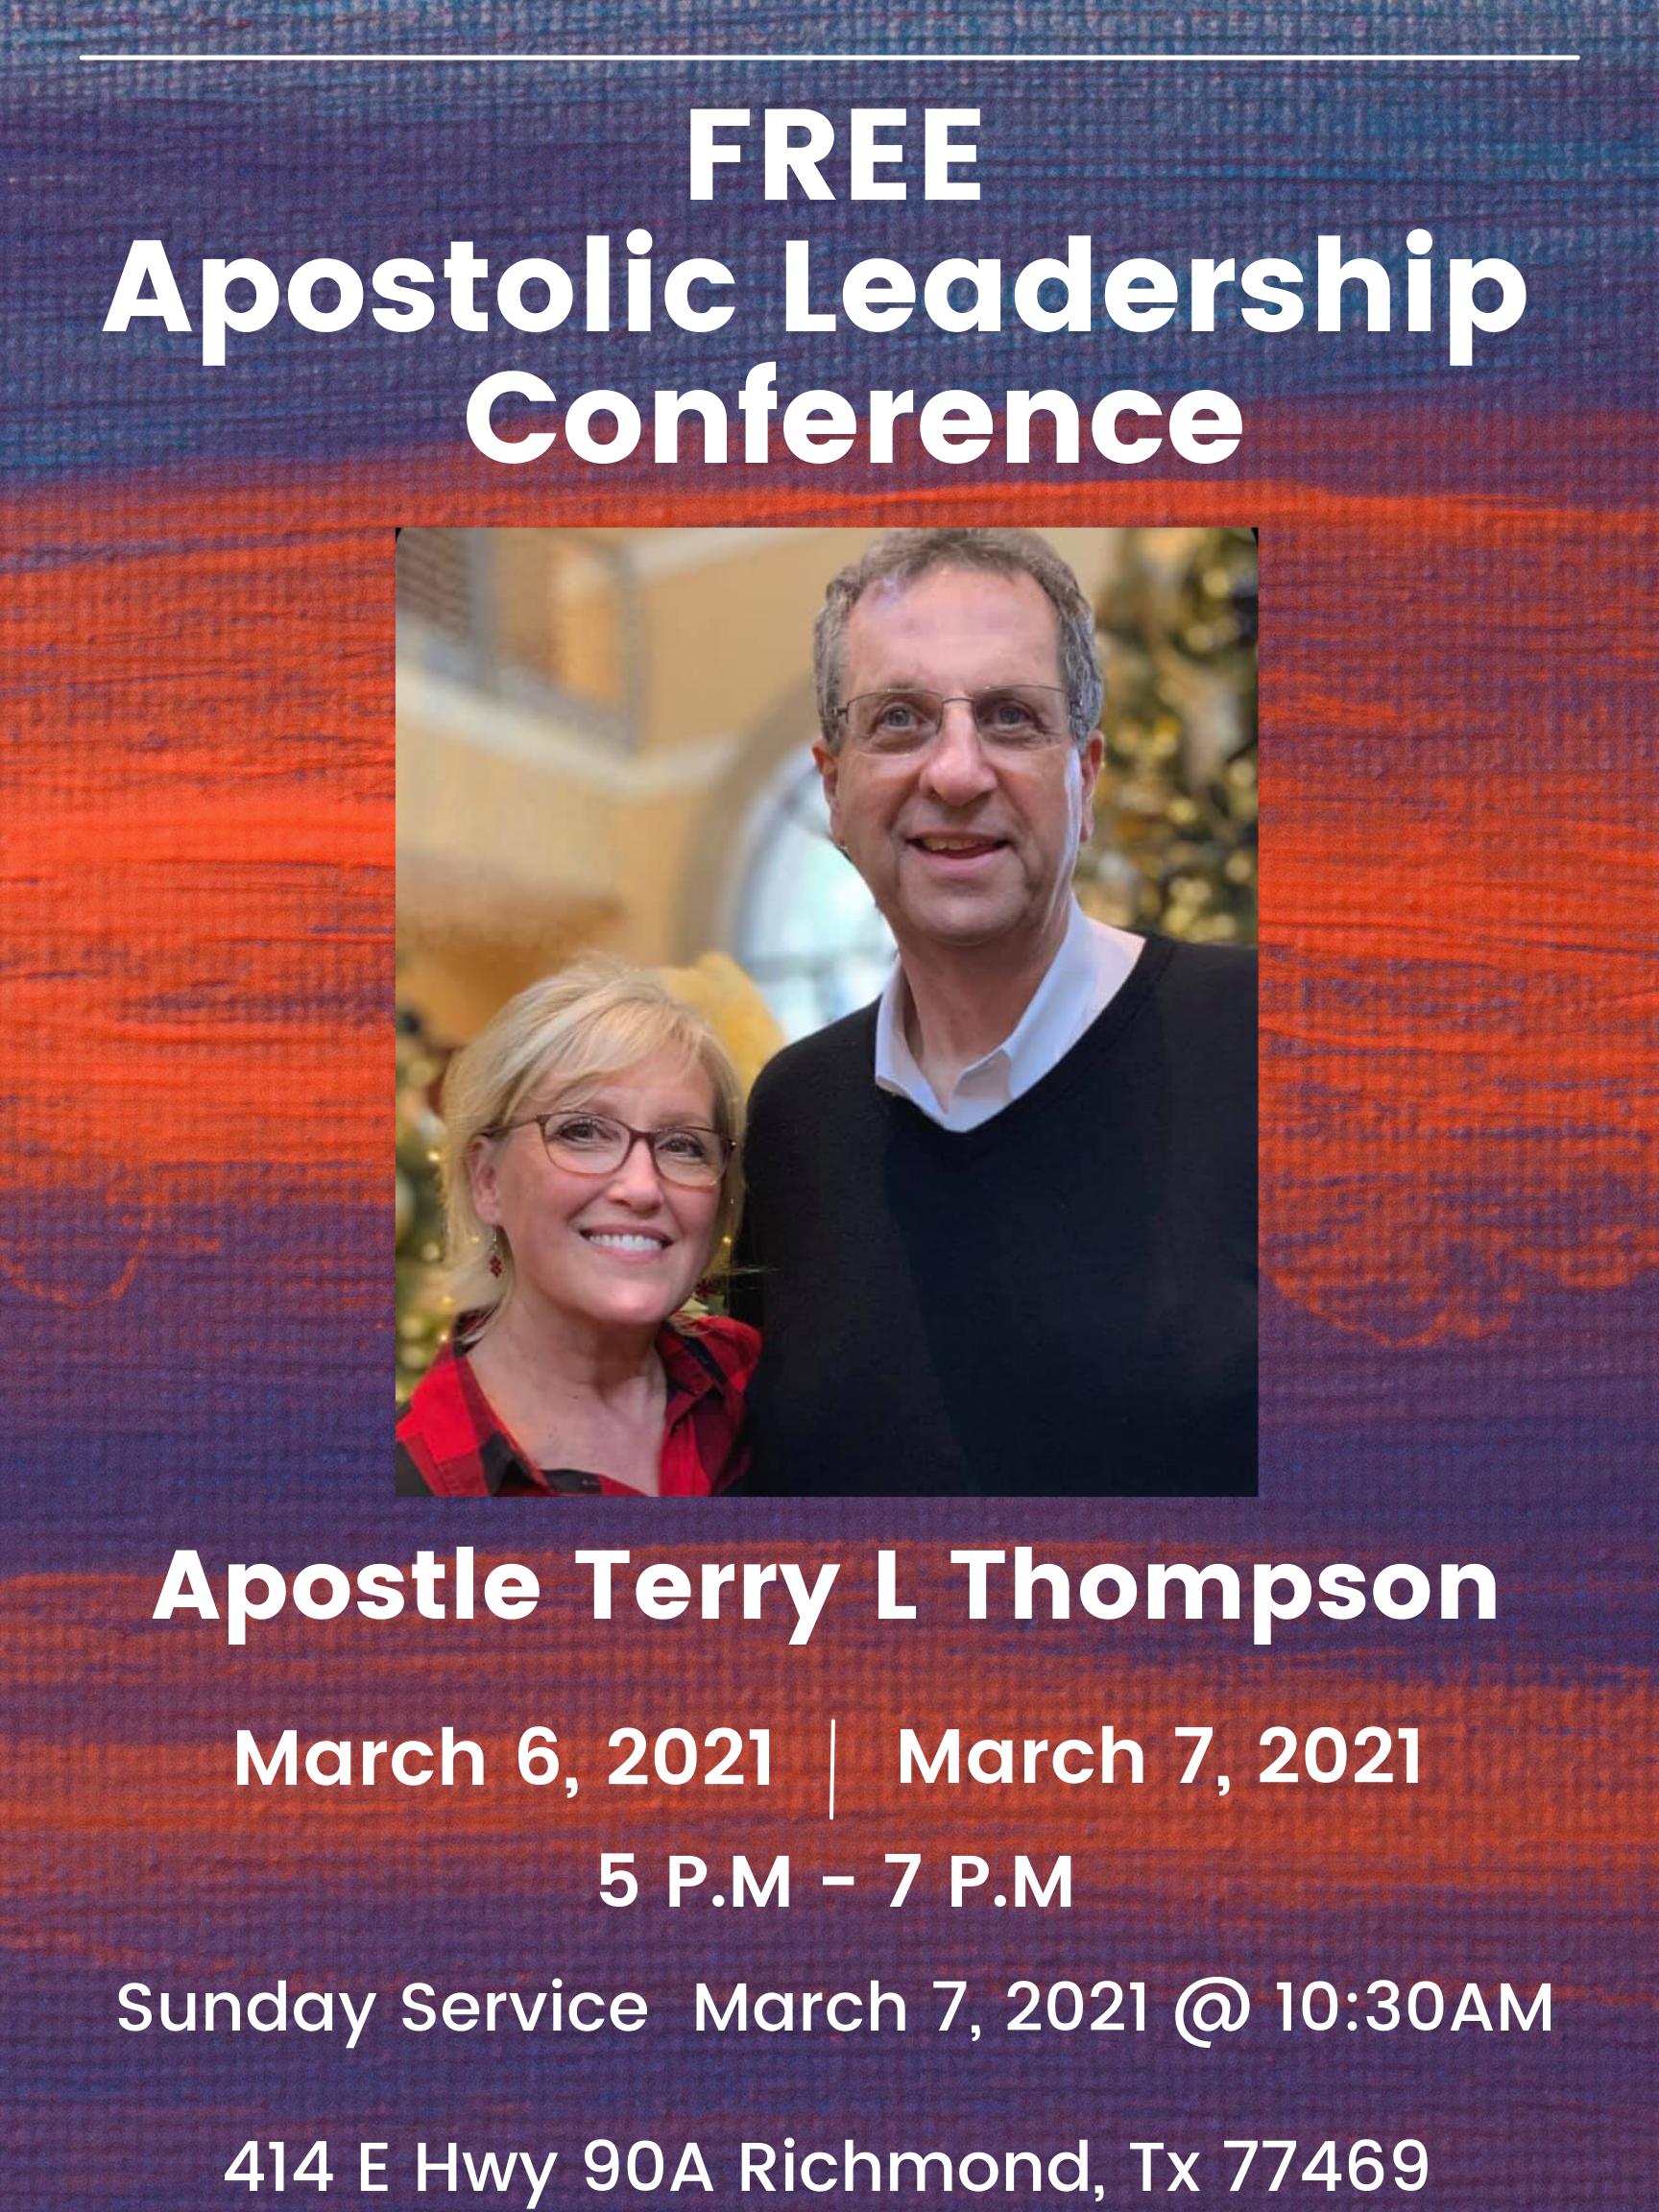 Free Apostolic Leadership Conference